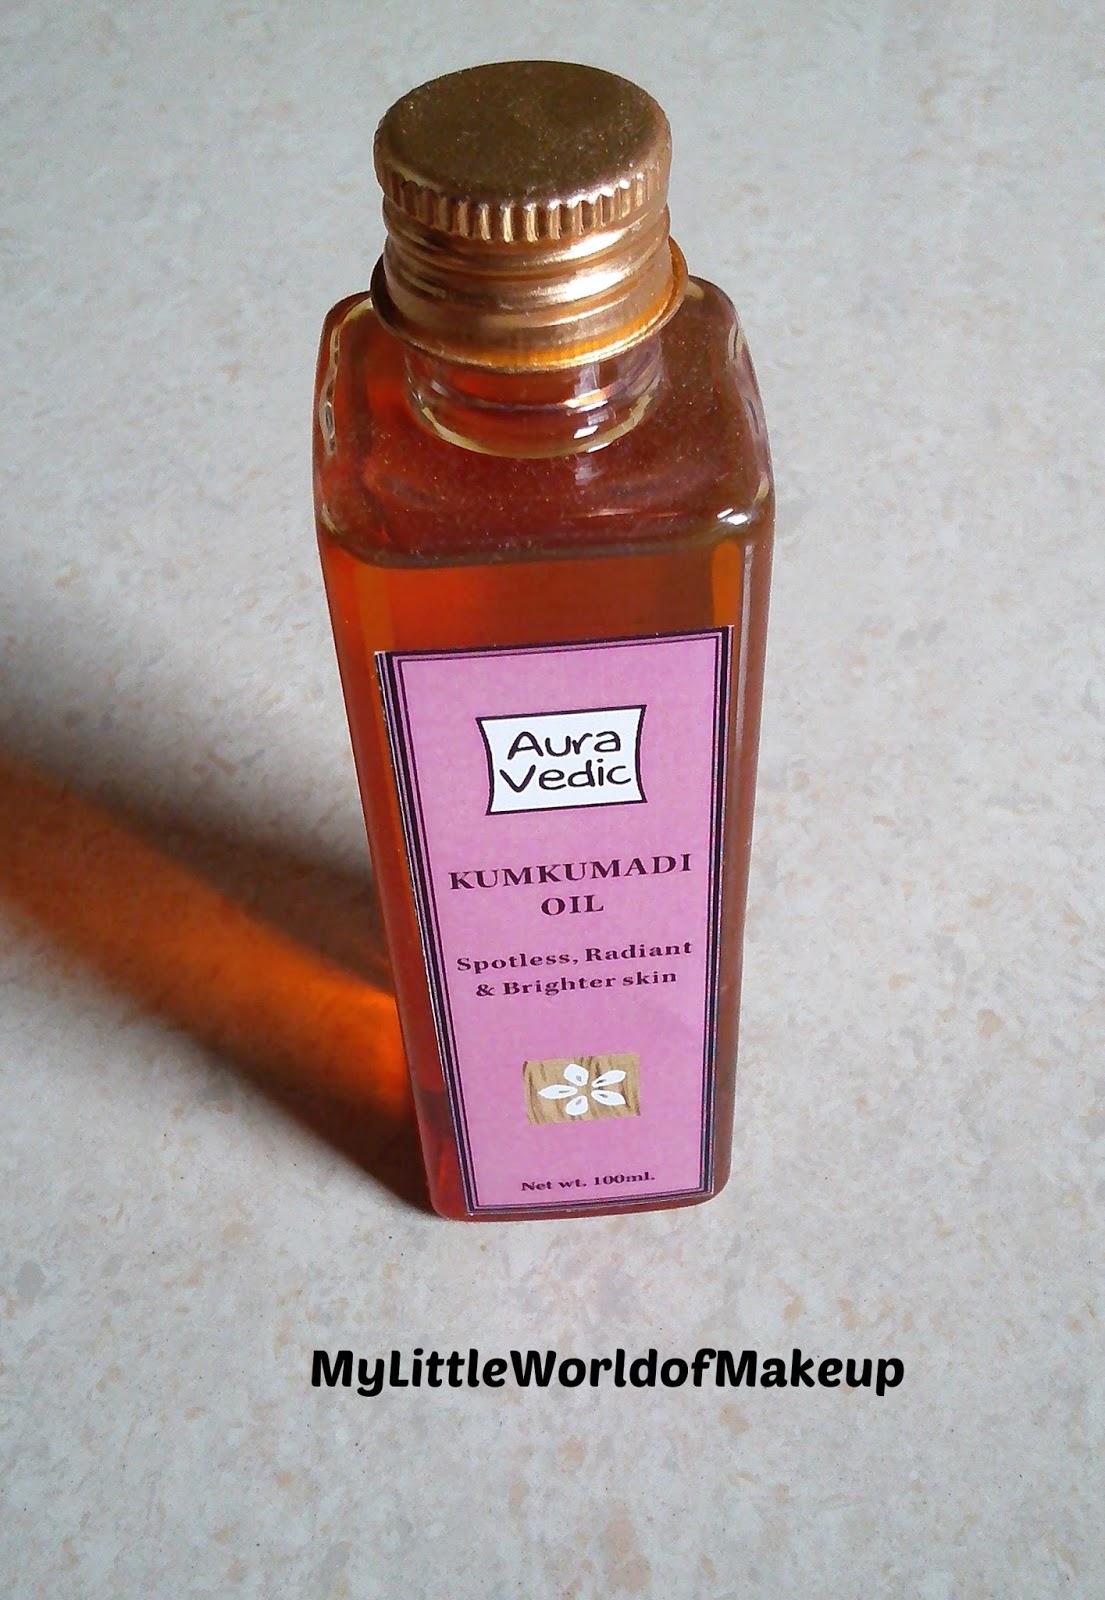 Auravedic Kumkumadi Oil Review